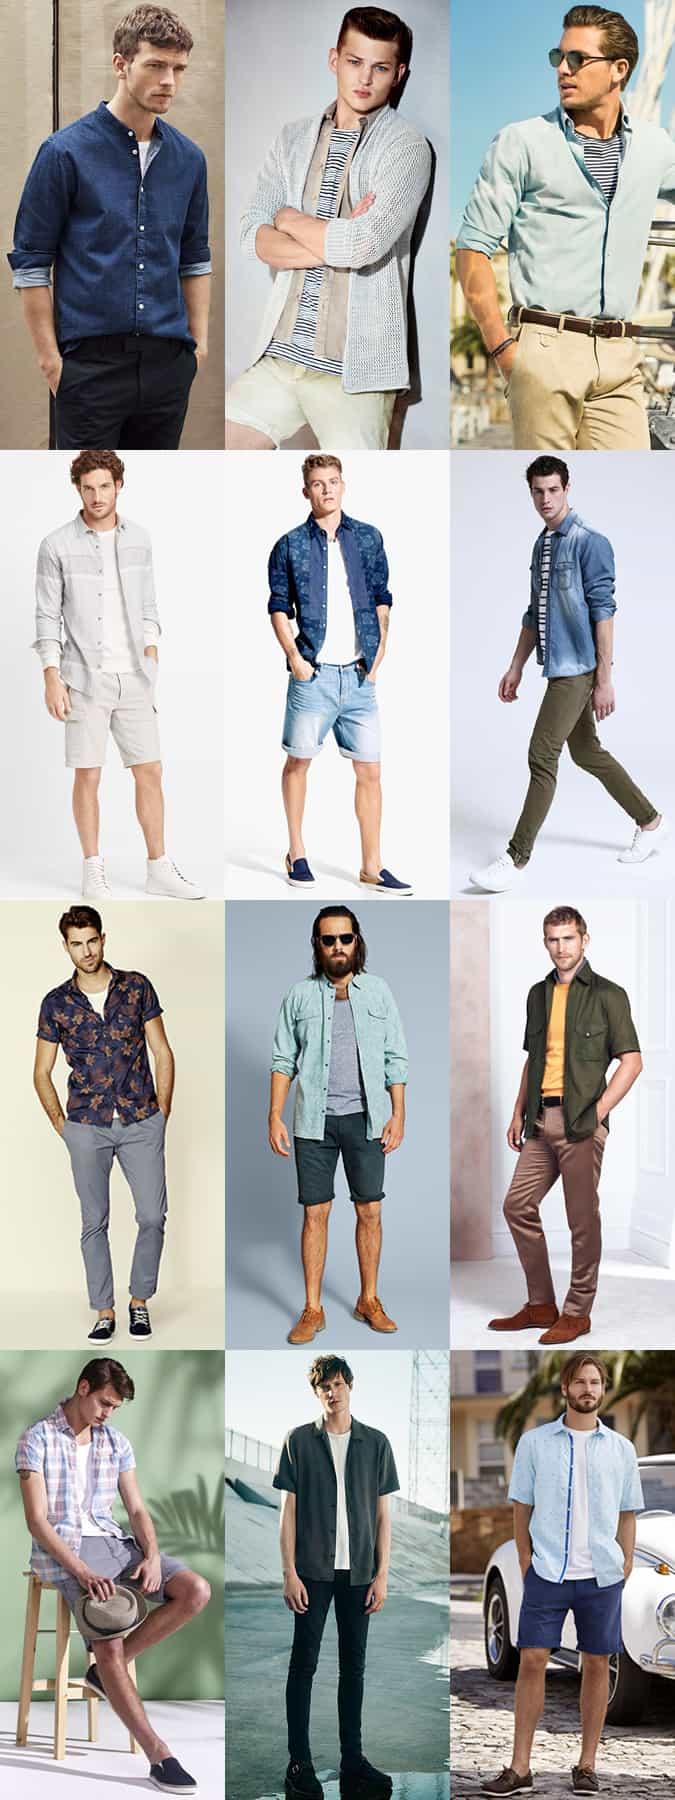 d2b1816bde93 Men s Summer Layering Outfit Inspiration Lookbook